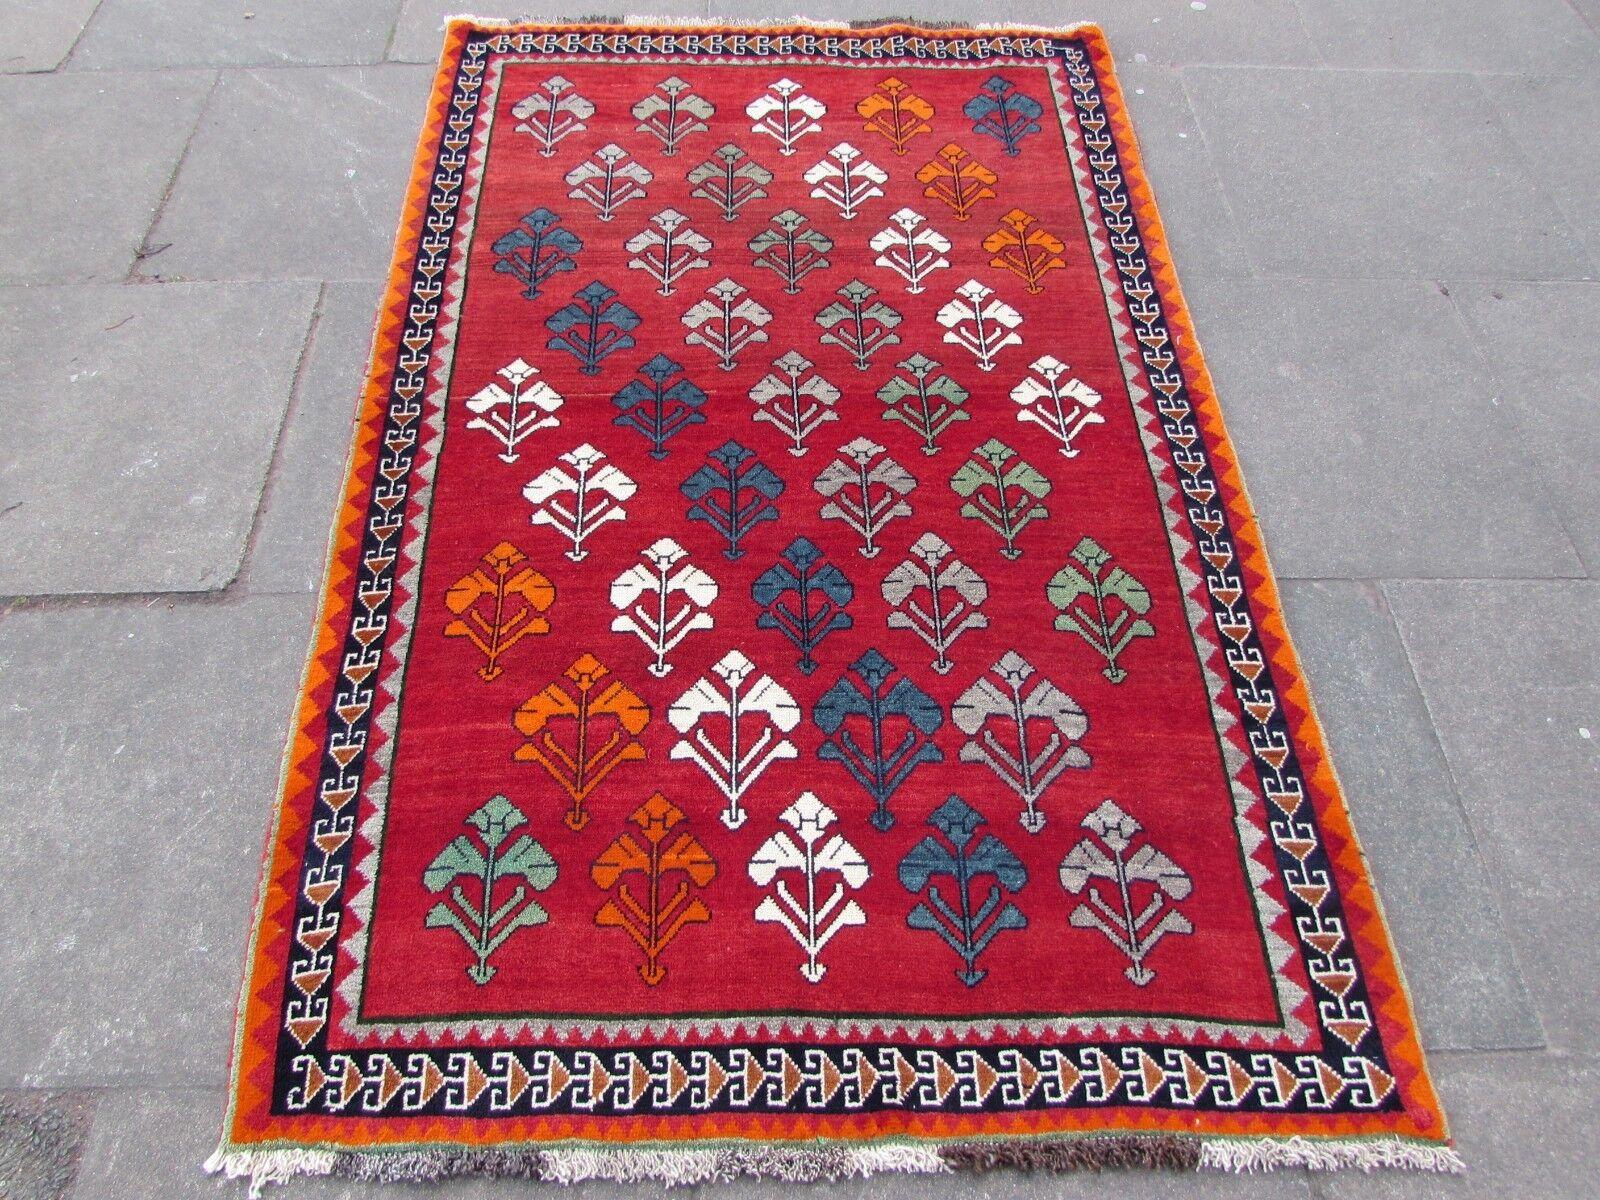 Tradicional Old Hecha a Mano Gabbeh Alfombra Oriental Rojo Lana Persa 195x125cm